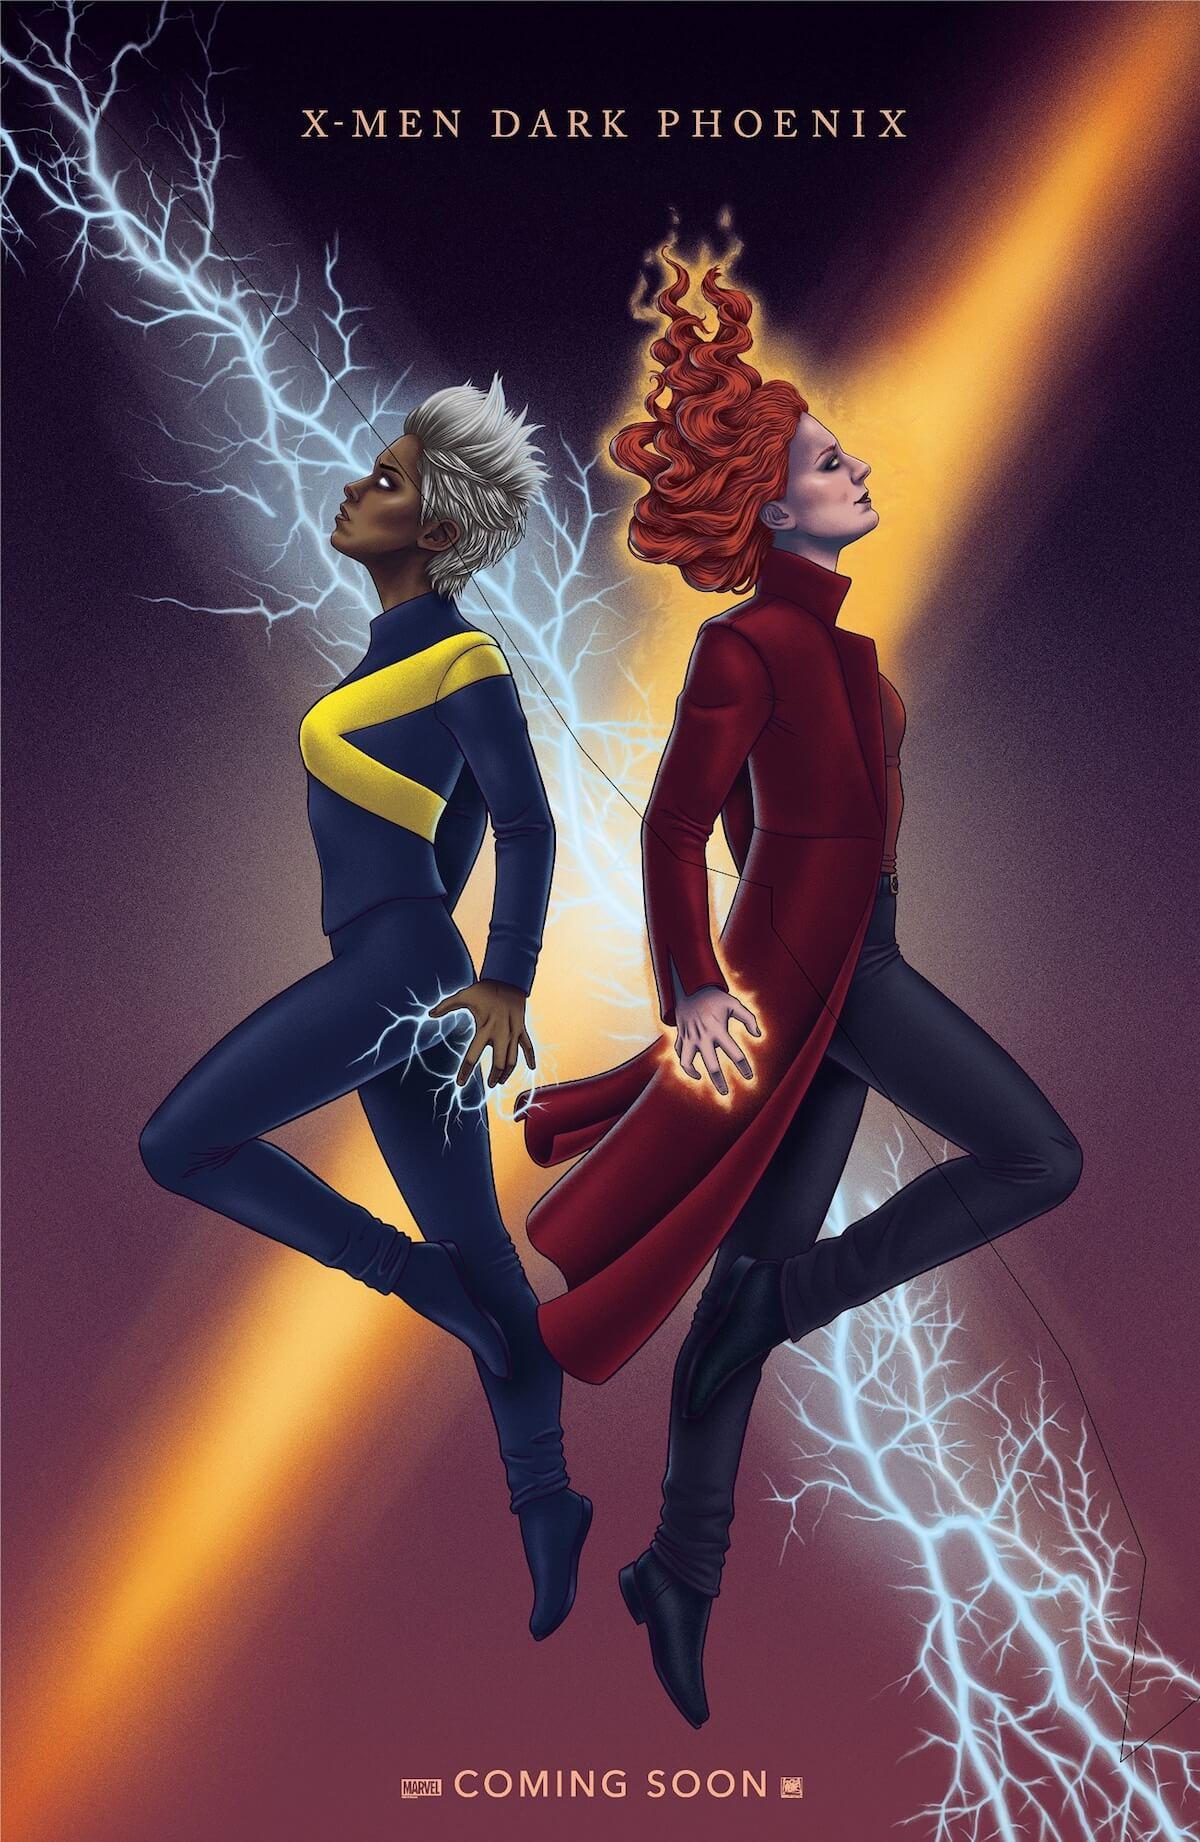 『X-MEN:ダーク・フェニックス』公開記念イベント<XーMEN DAY>が開催!ジーン役ソフィー・ターナーの特別映像解禁 film190517_xmenday_11